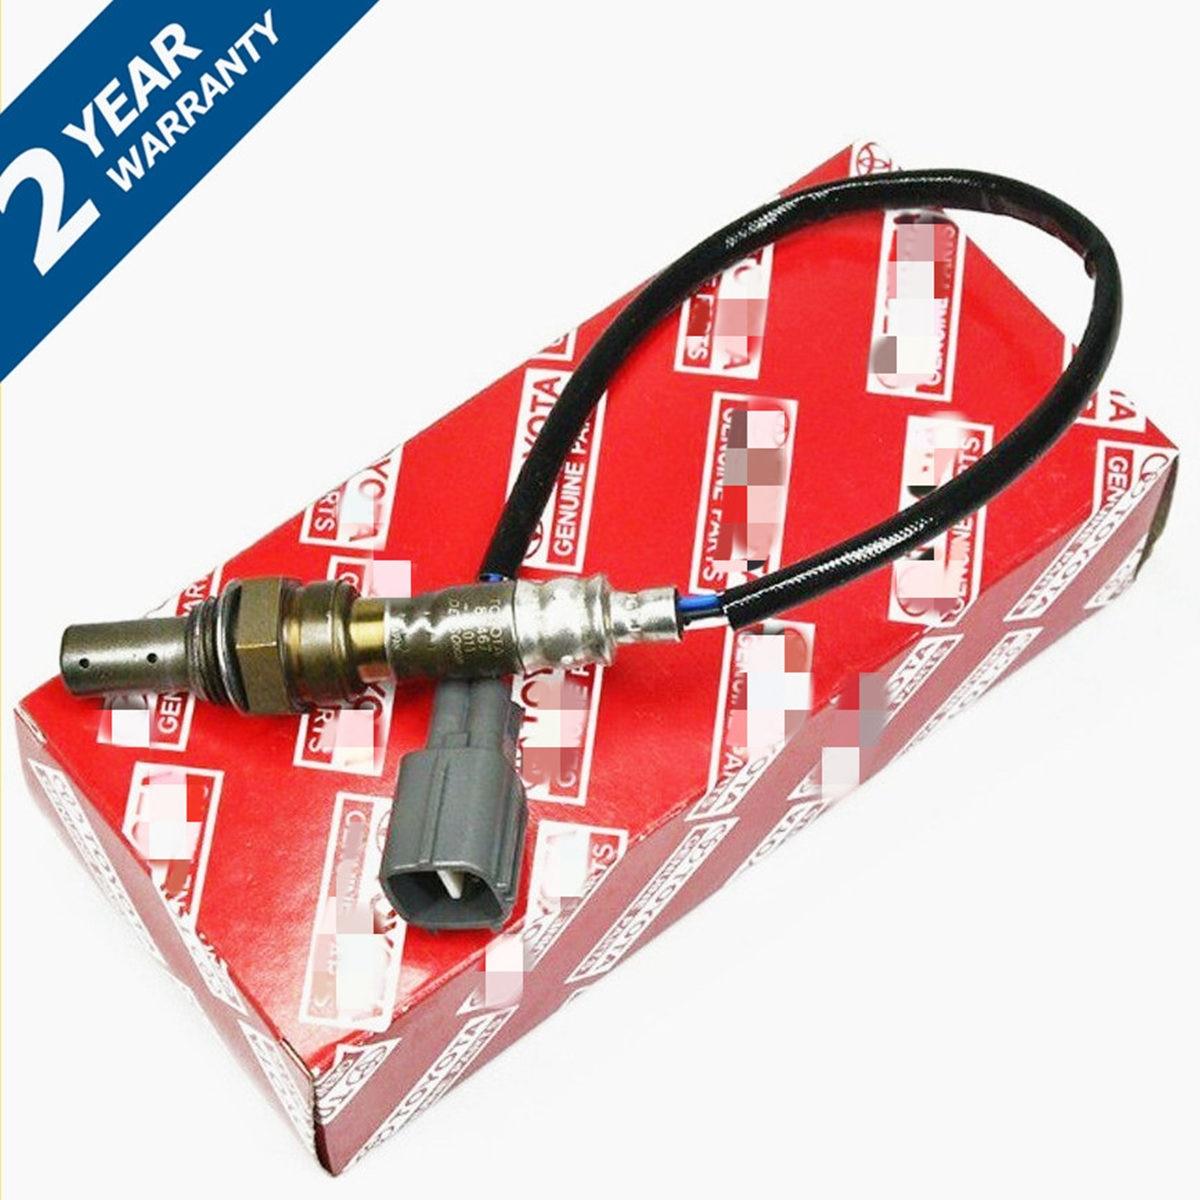 Luft Kraftstoff Verhältnis O2 Sauerstoff Sensor SG848 89467-48011 234-9009 Für Toyota Lexu RX300 G1R